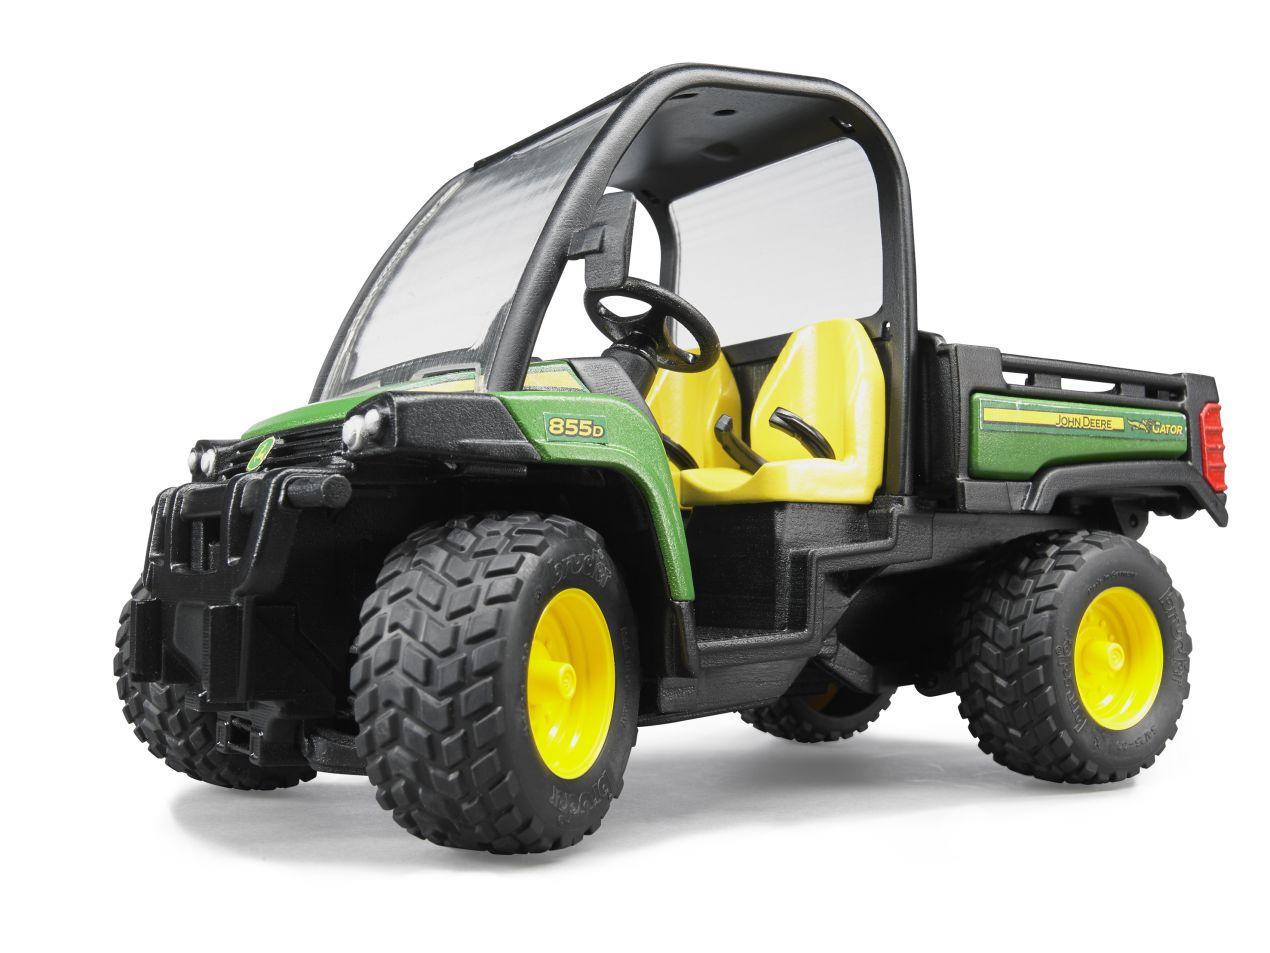 New John Deere XUV 855D S4 Gator 4x4 utility vehicle